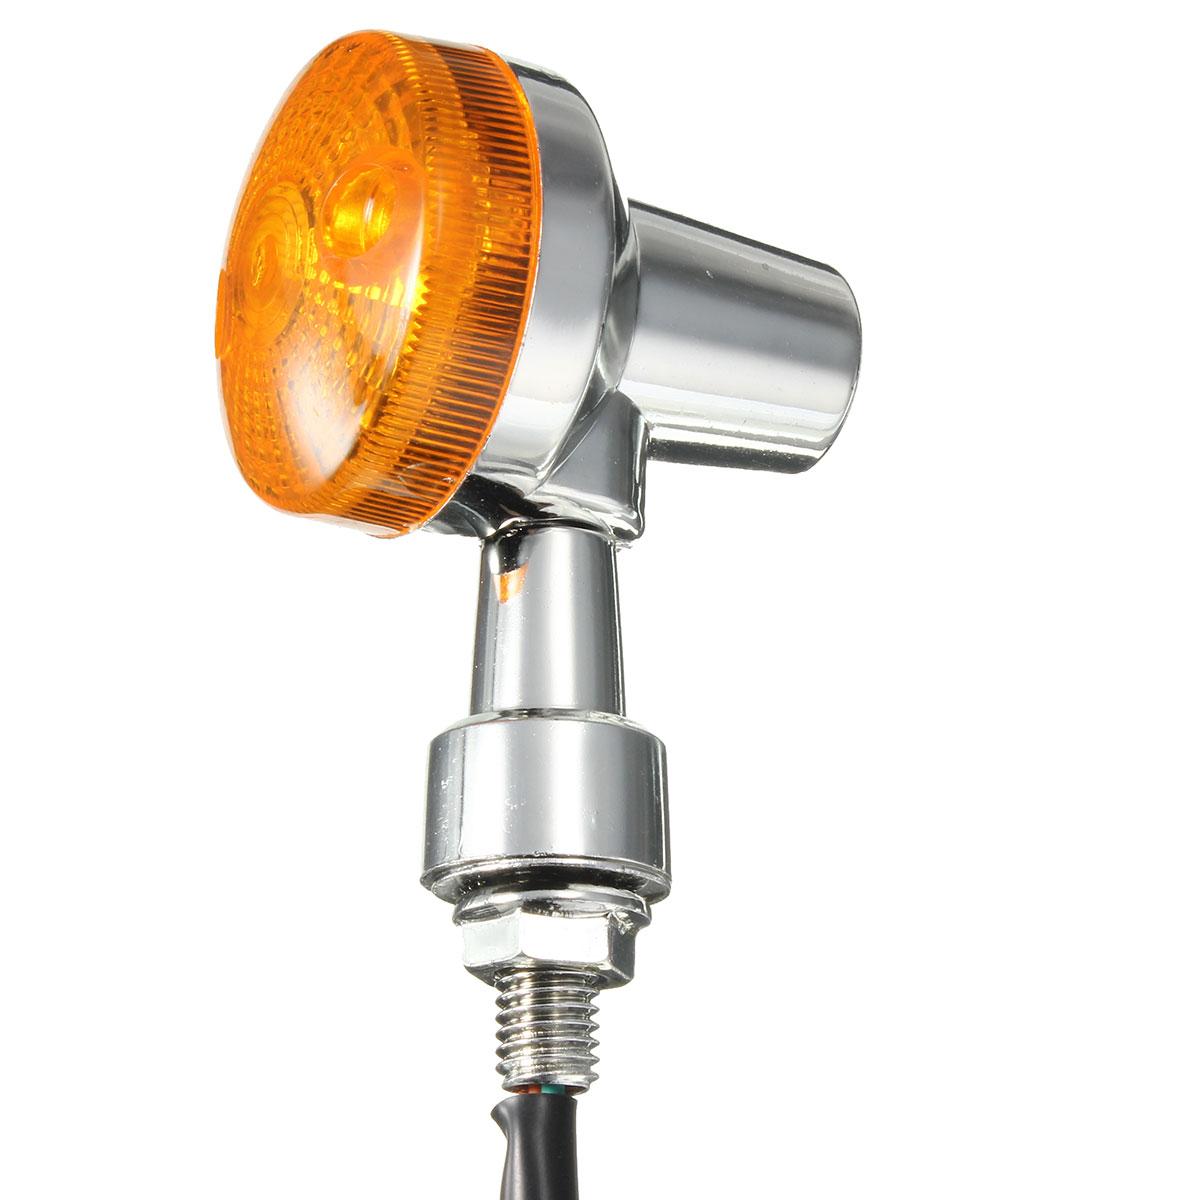 4pcs 12V Motorcycle Turn Brake Signal Light Bulb Lamp Amber Indicators